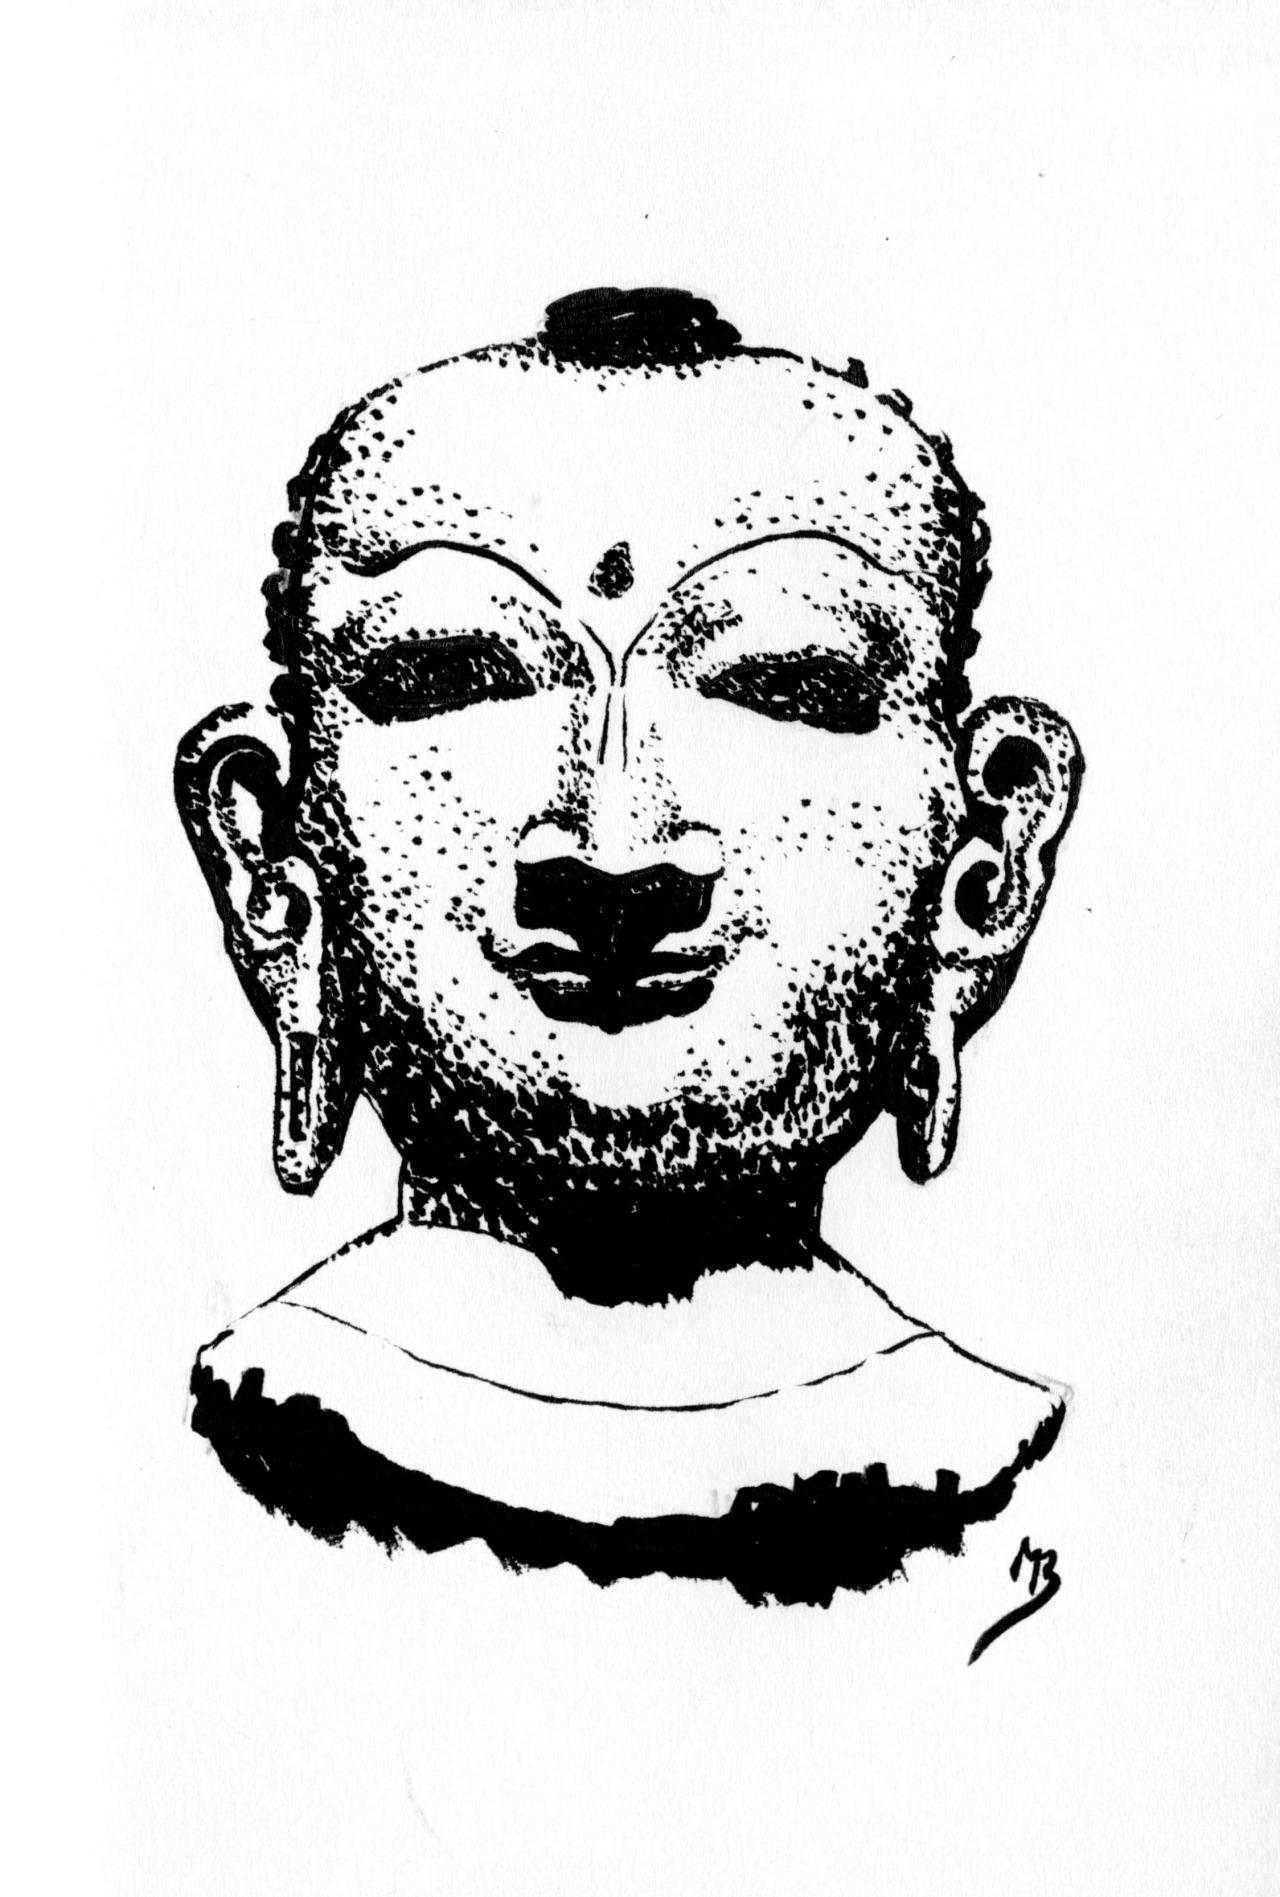 jina Népal dessin musée Guimet